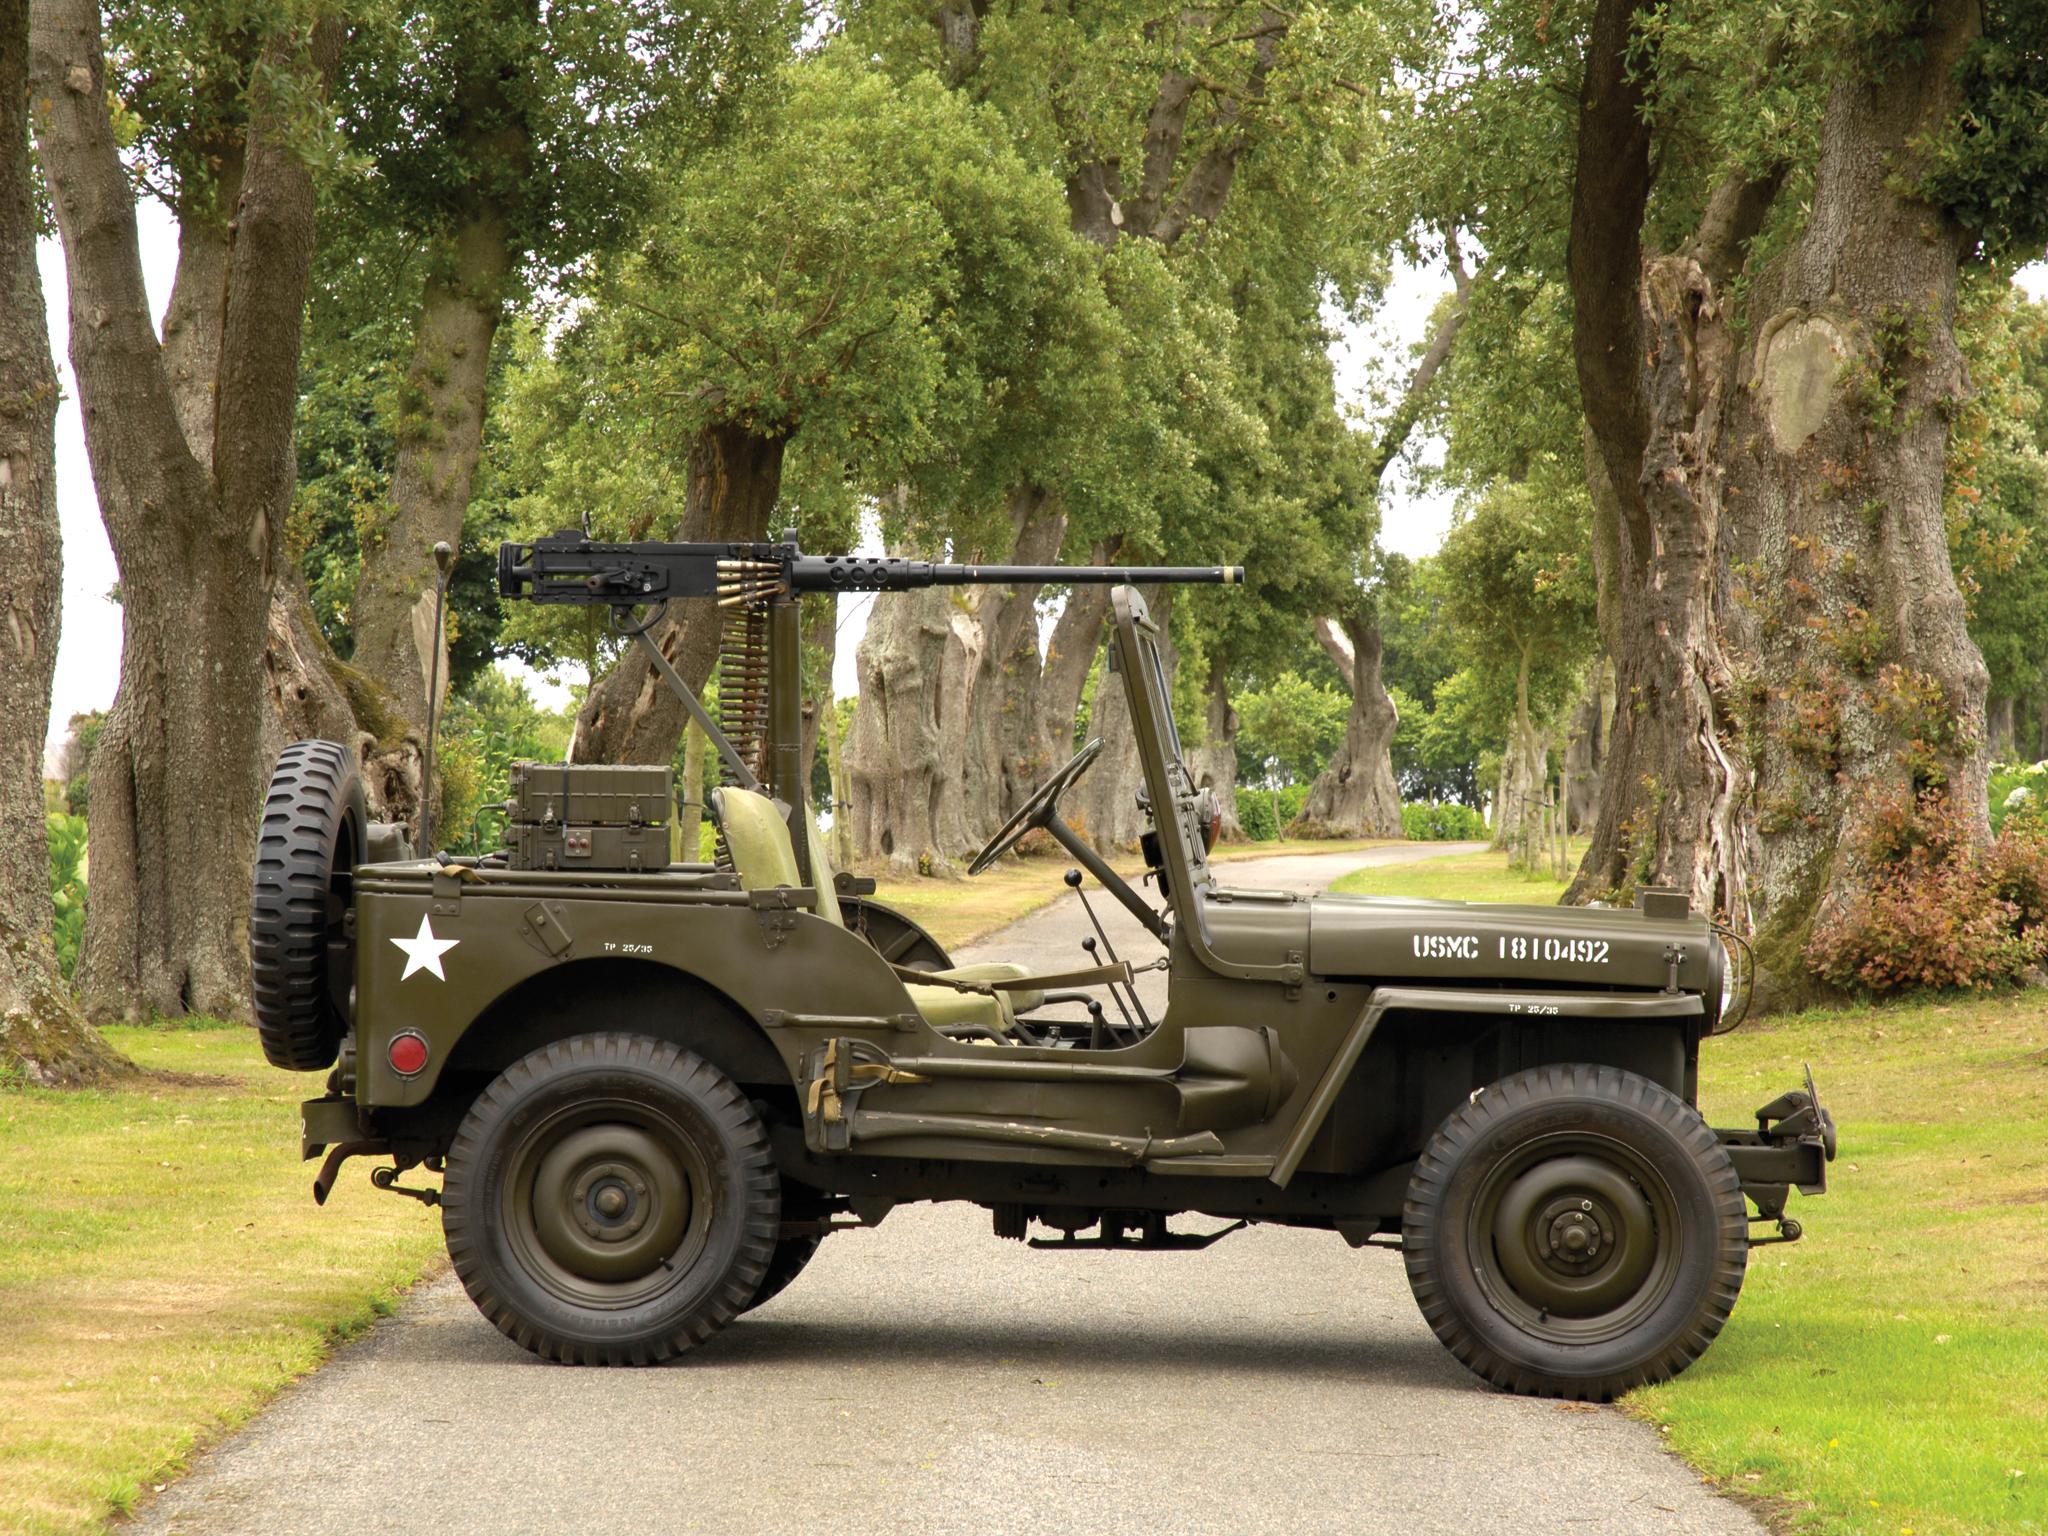 1950 Willys M38 Jeep Truck Trucks Military Retro Weapon Weapons Gun Pick Up Guns G Wallpaper 2048x1536 94294 Wallpaperup